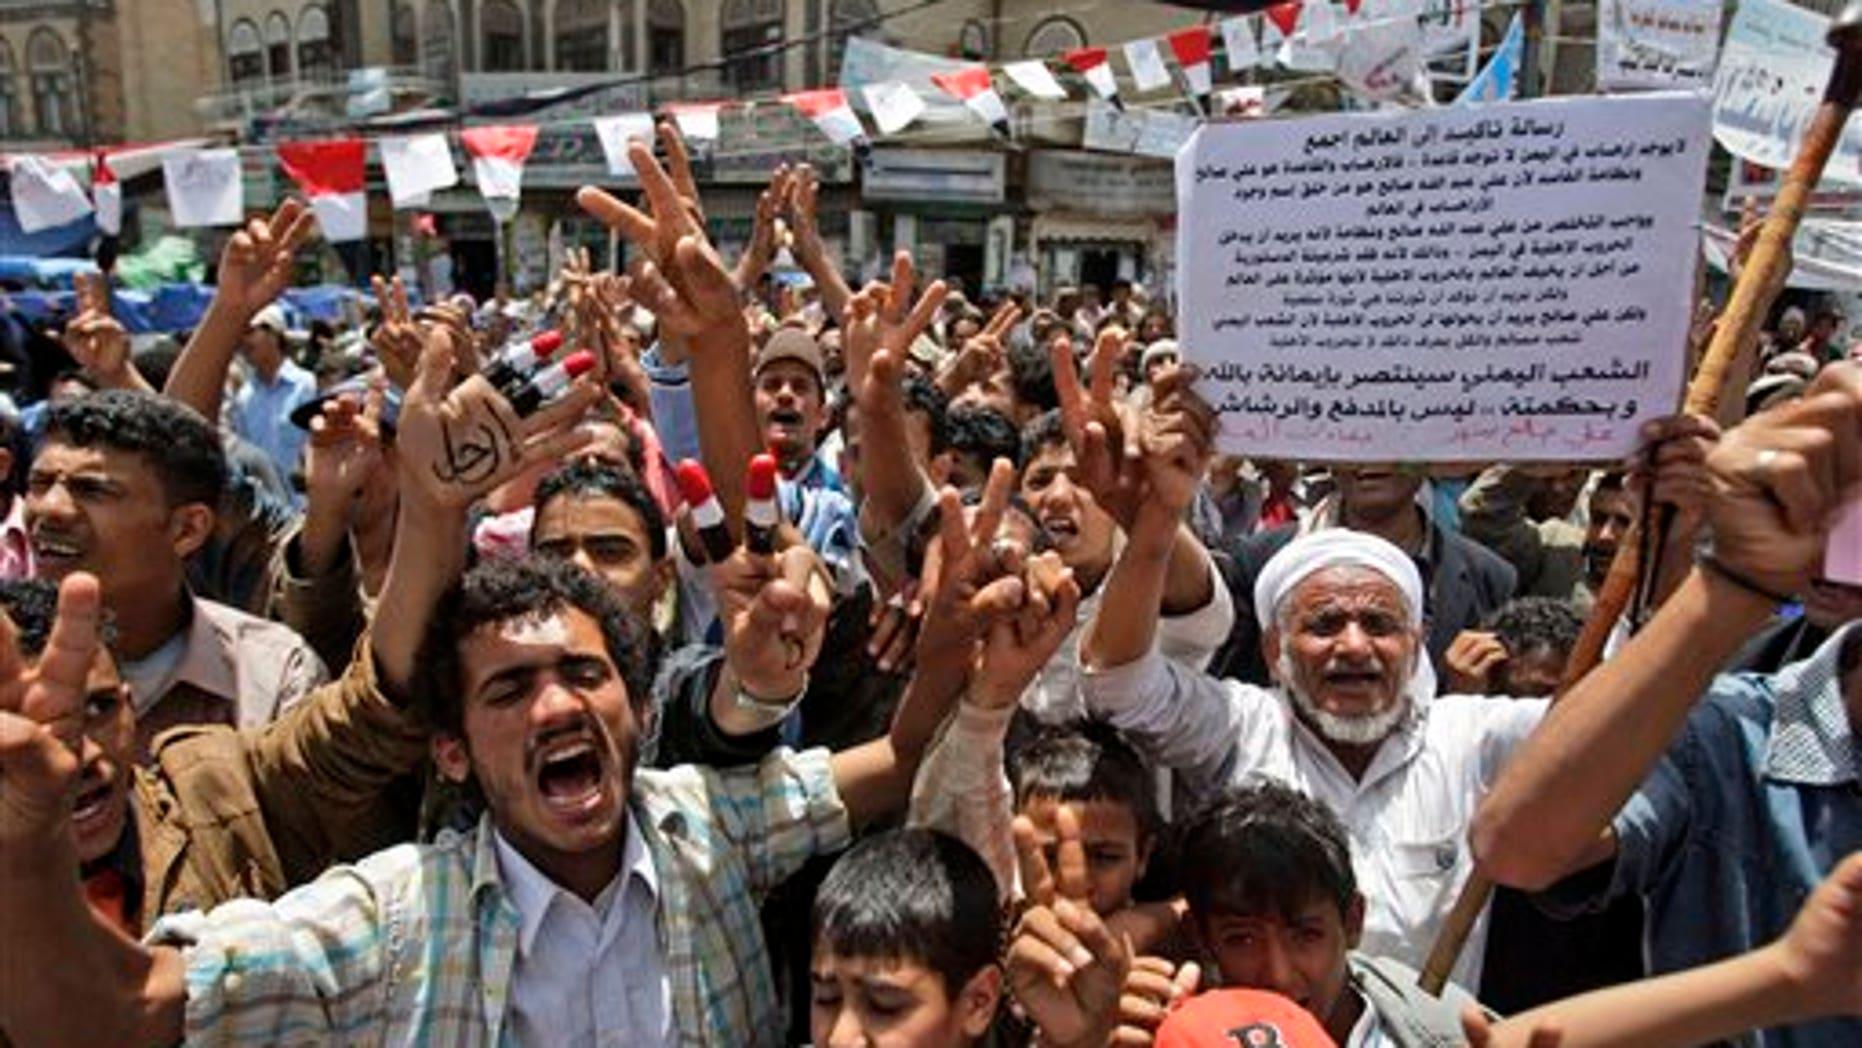 May 29: Anti-government protestors shout slogans during a demonstration demanding the resignation of Yemeni President Ali Abdullah Saleh in Sanaa, Yemen. (AP)